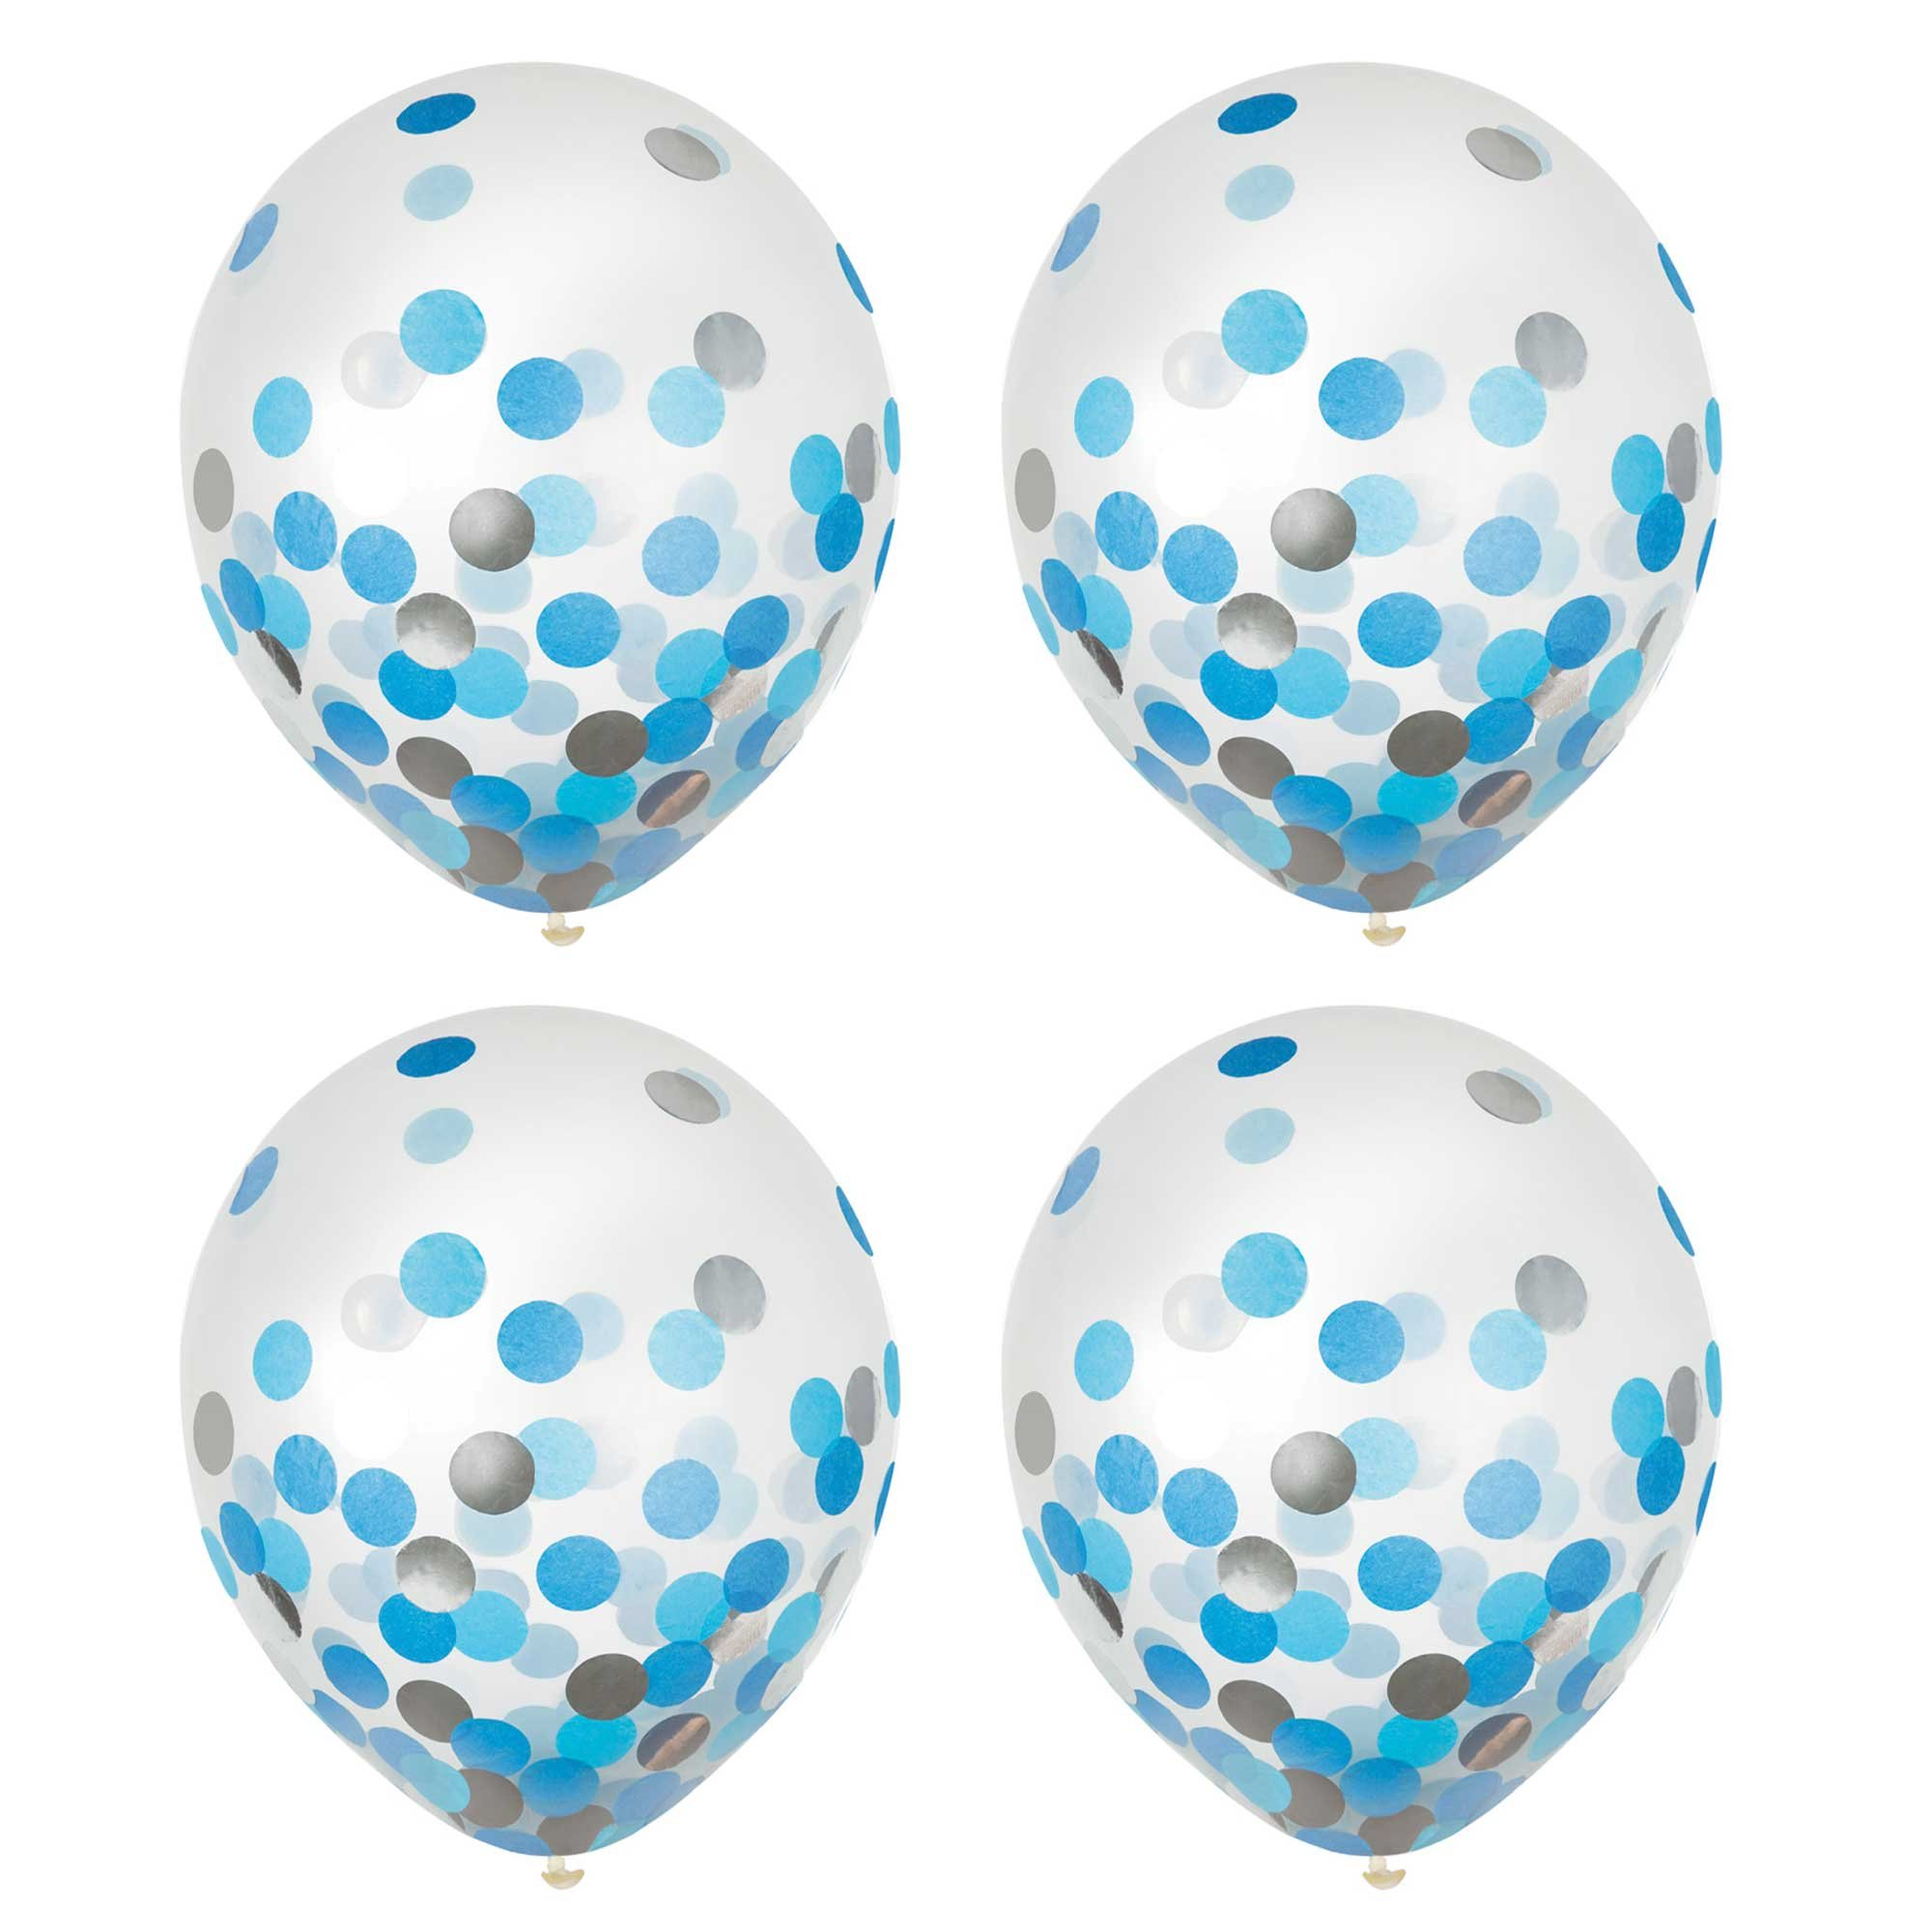 Latex Balloons 30cm & Confetti Blue & Silver